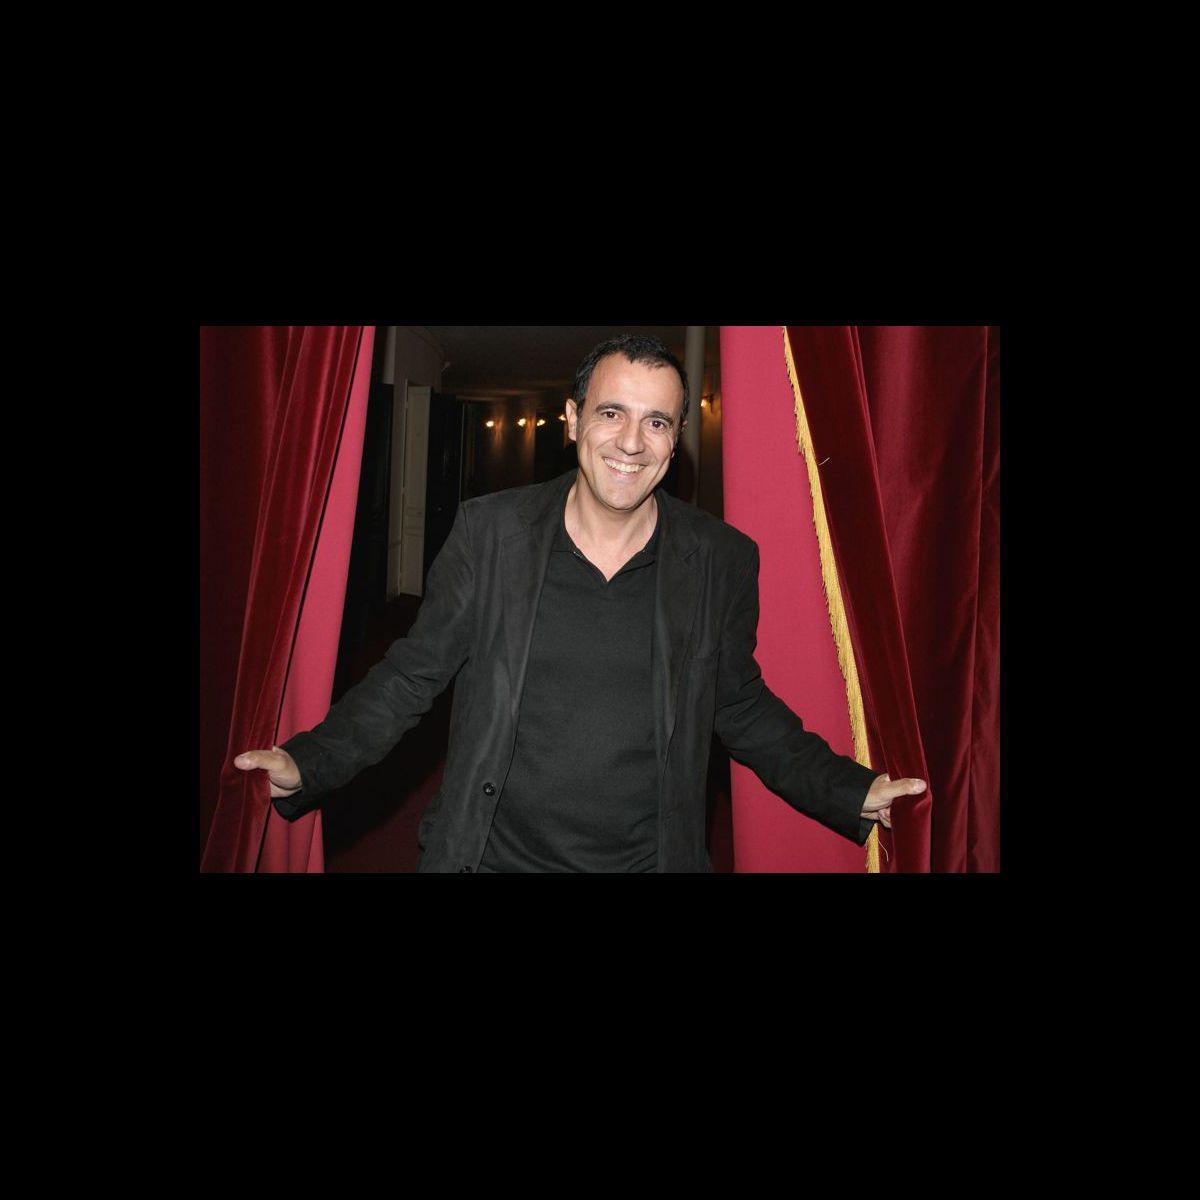 Thierry beccaro motus c 39 est une s curit pour moi for Telematin theatre